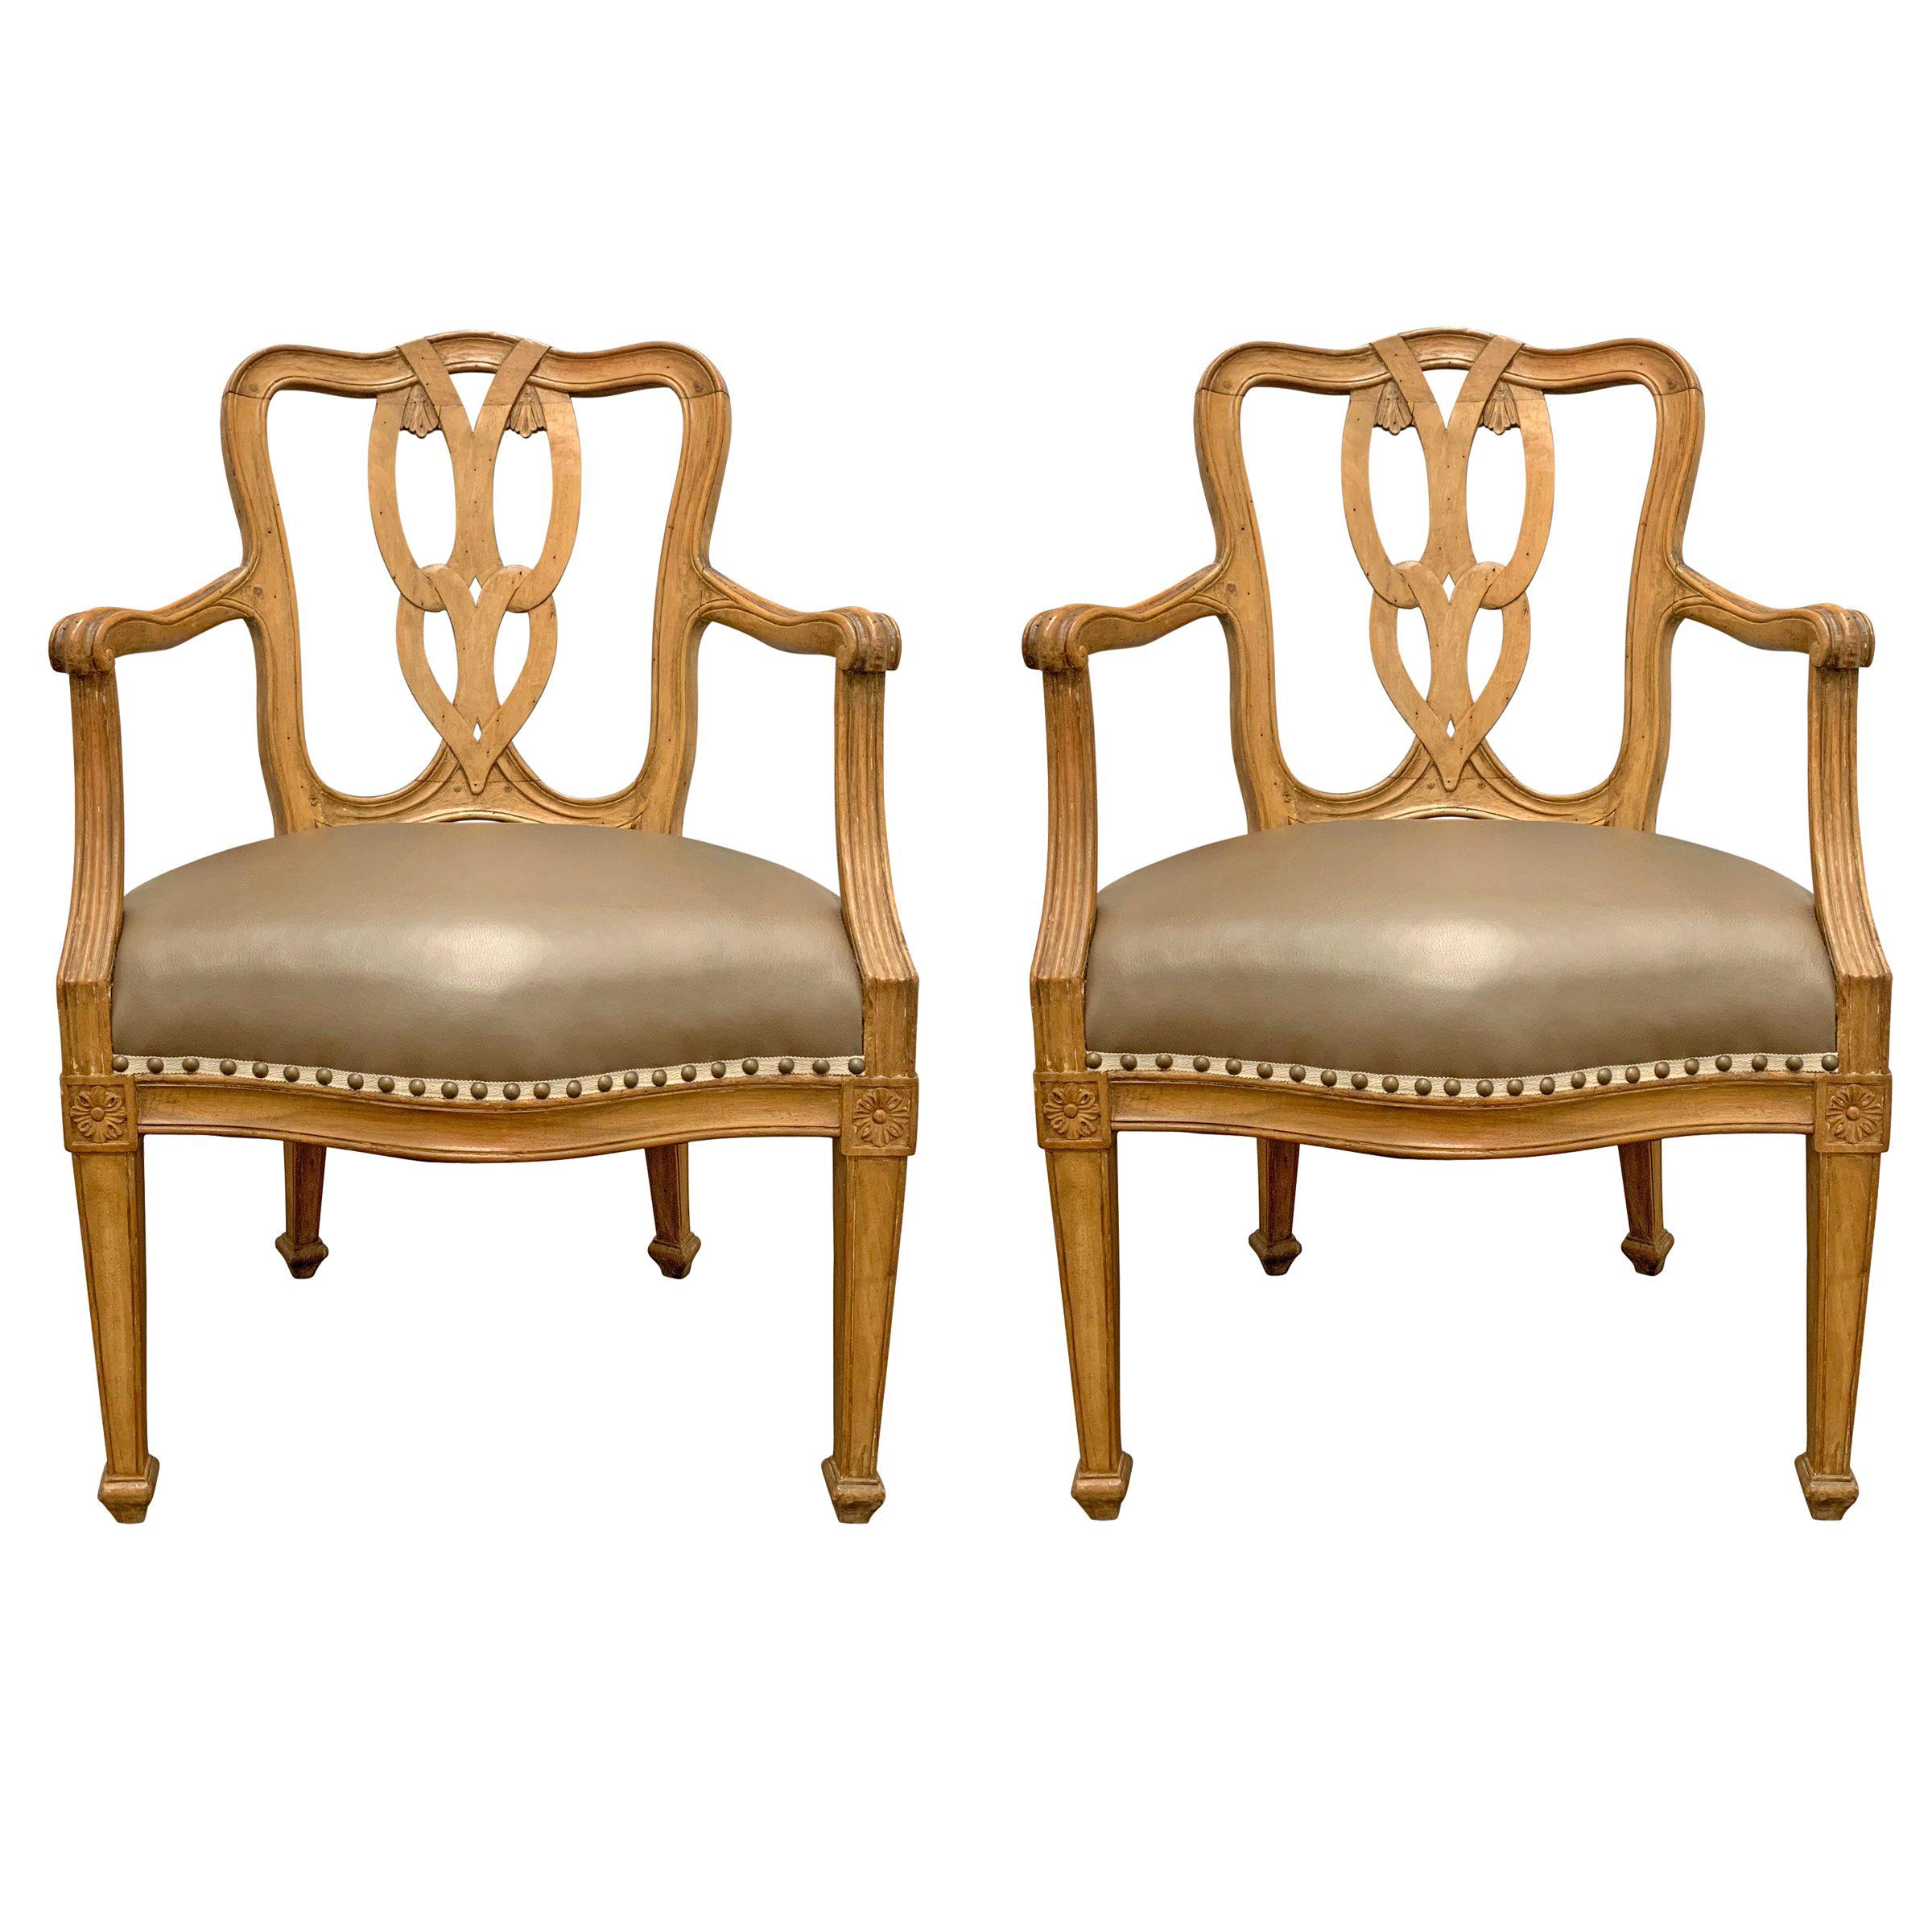 Pair of Early 20th Century Italian Armchairs